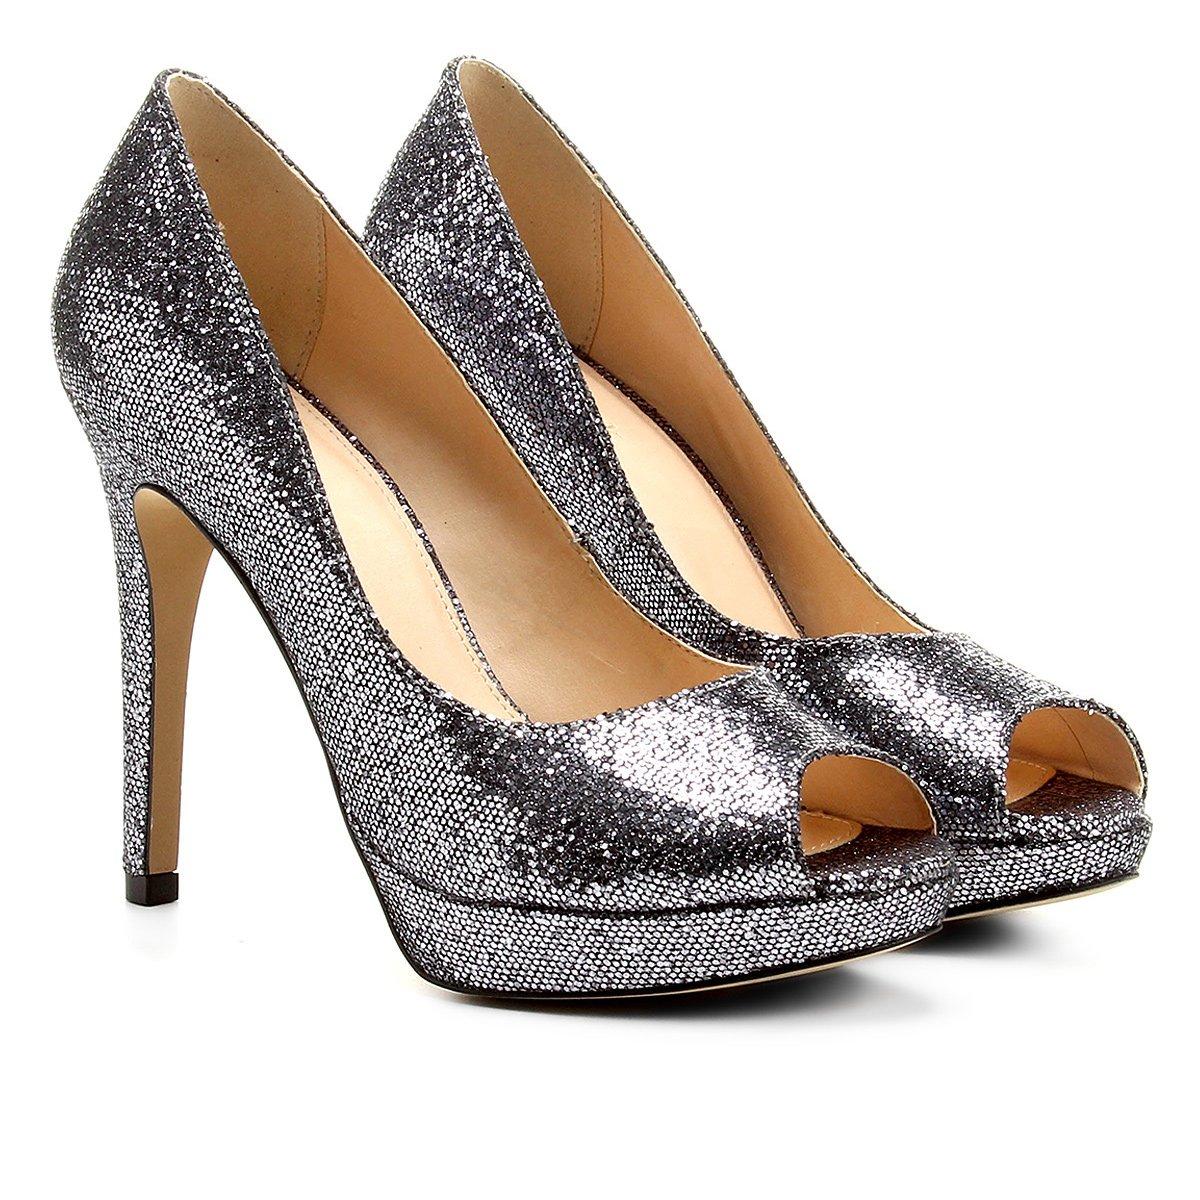 5acbdfdb6 Peep Toe Shoestock Meia Pata Glitter | Shoestock